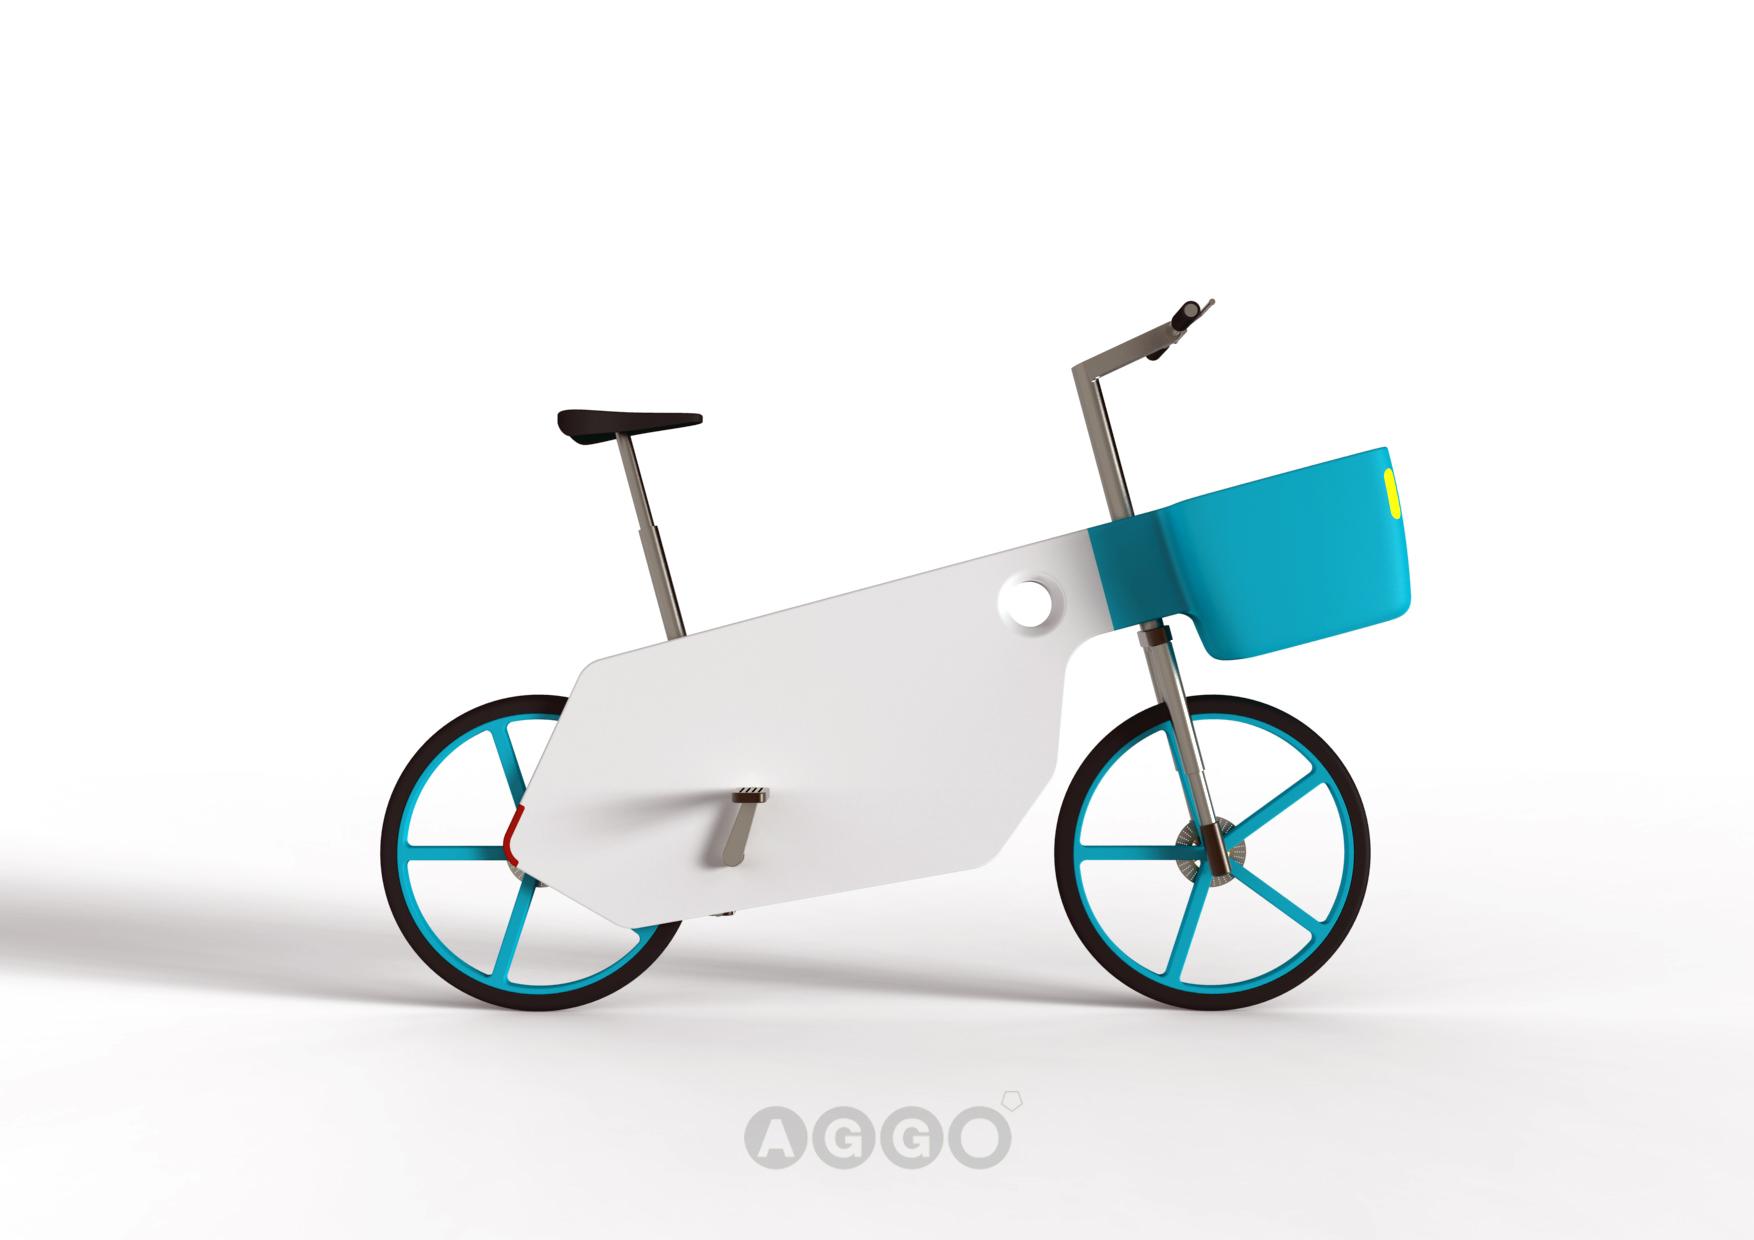 aggo_tesla_bike014.jpg